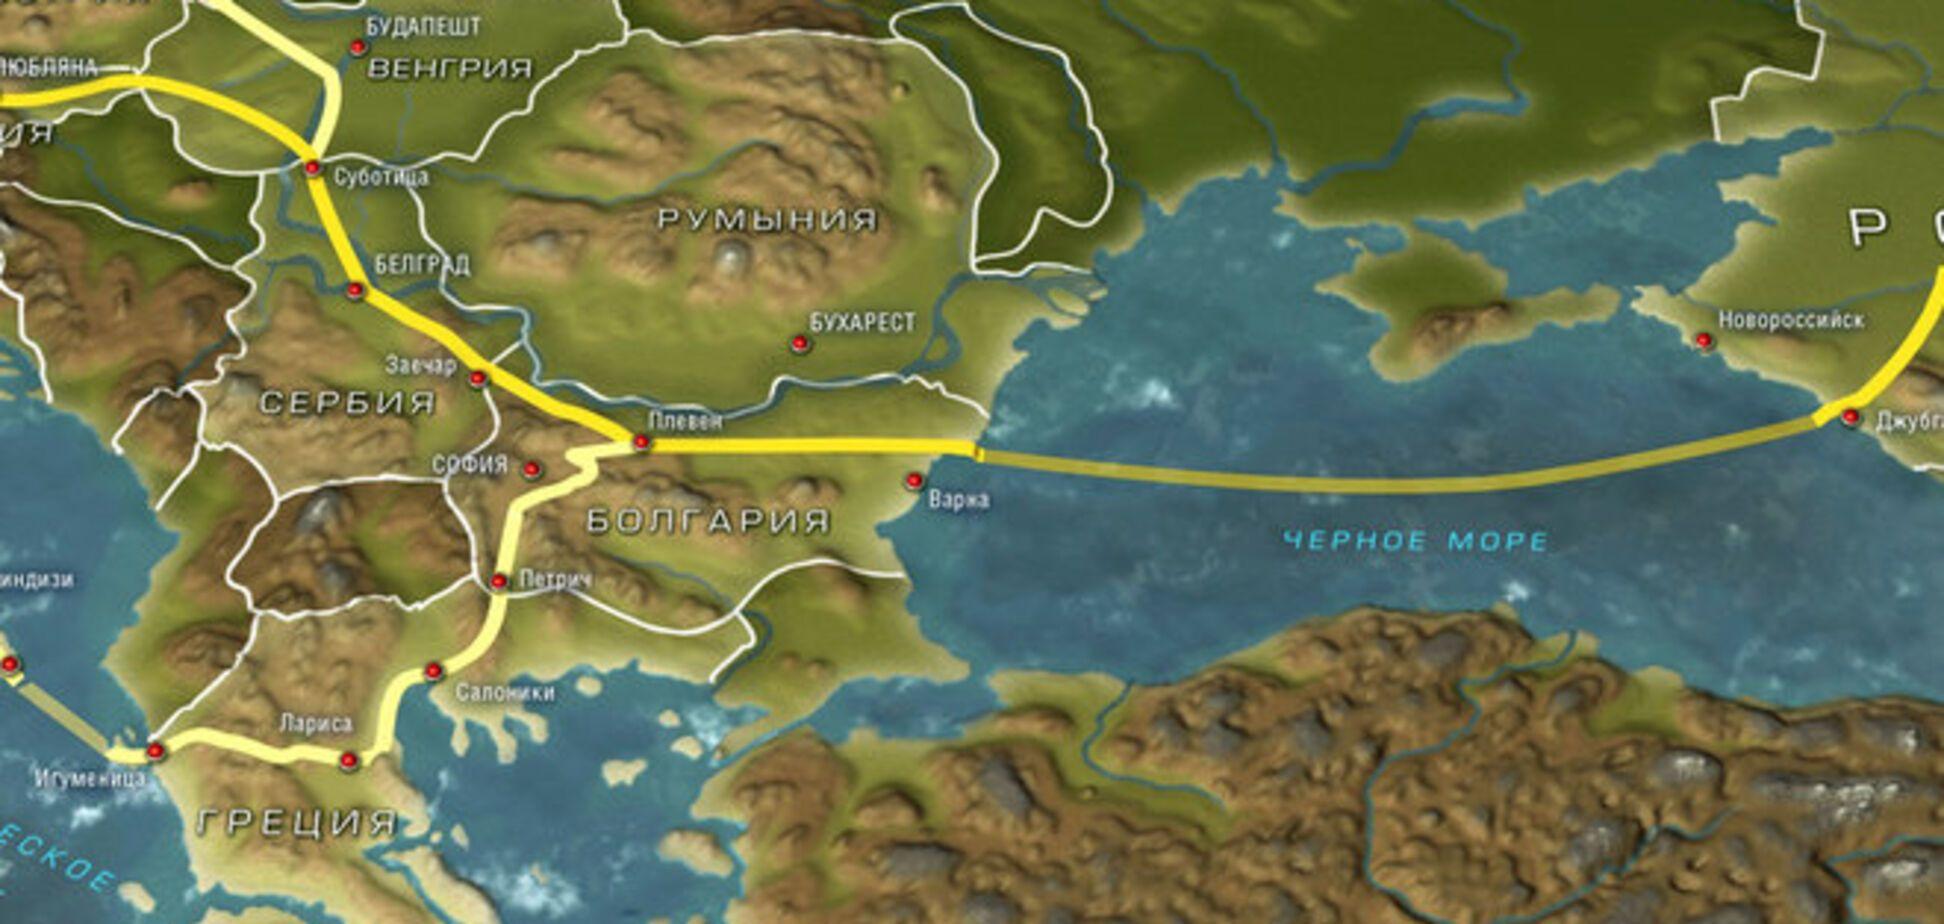 Отказ от 'Южного потока' - начало конца России?